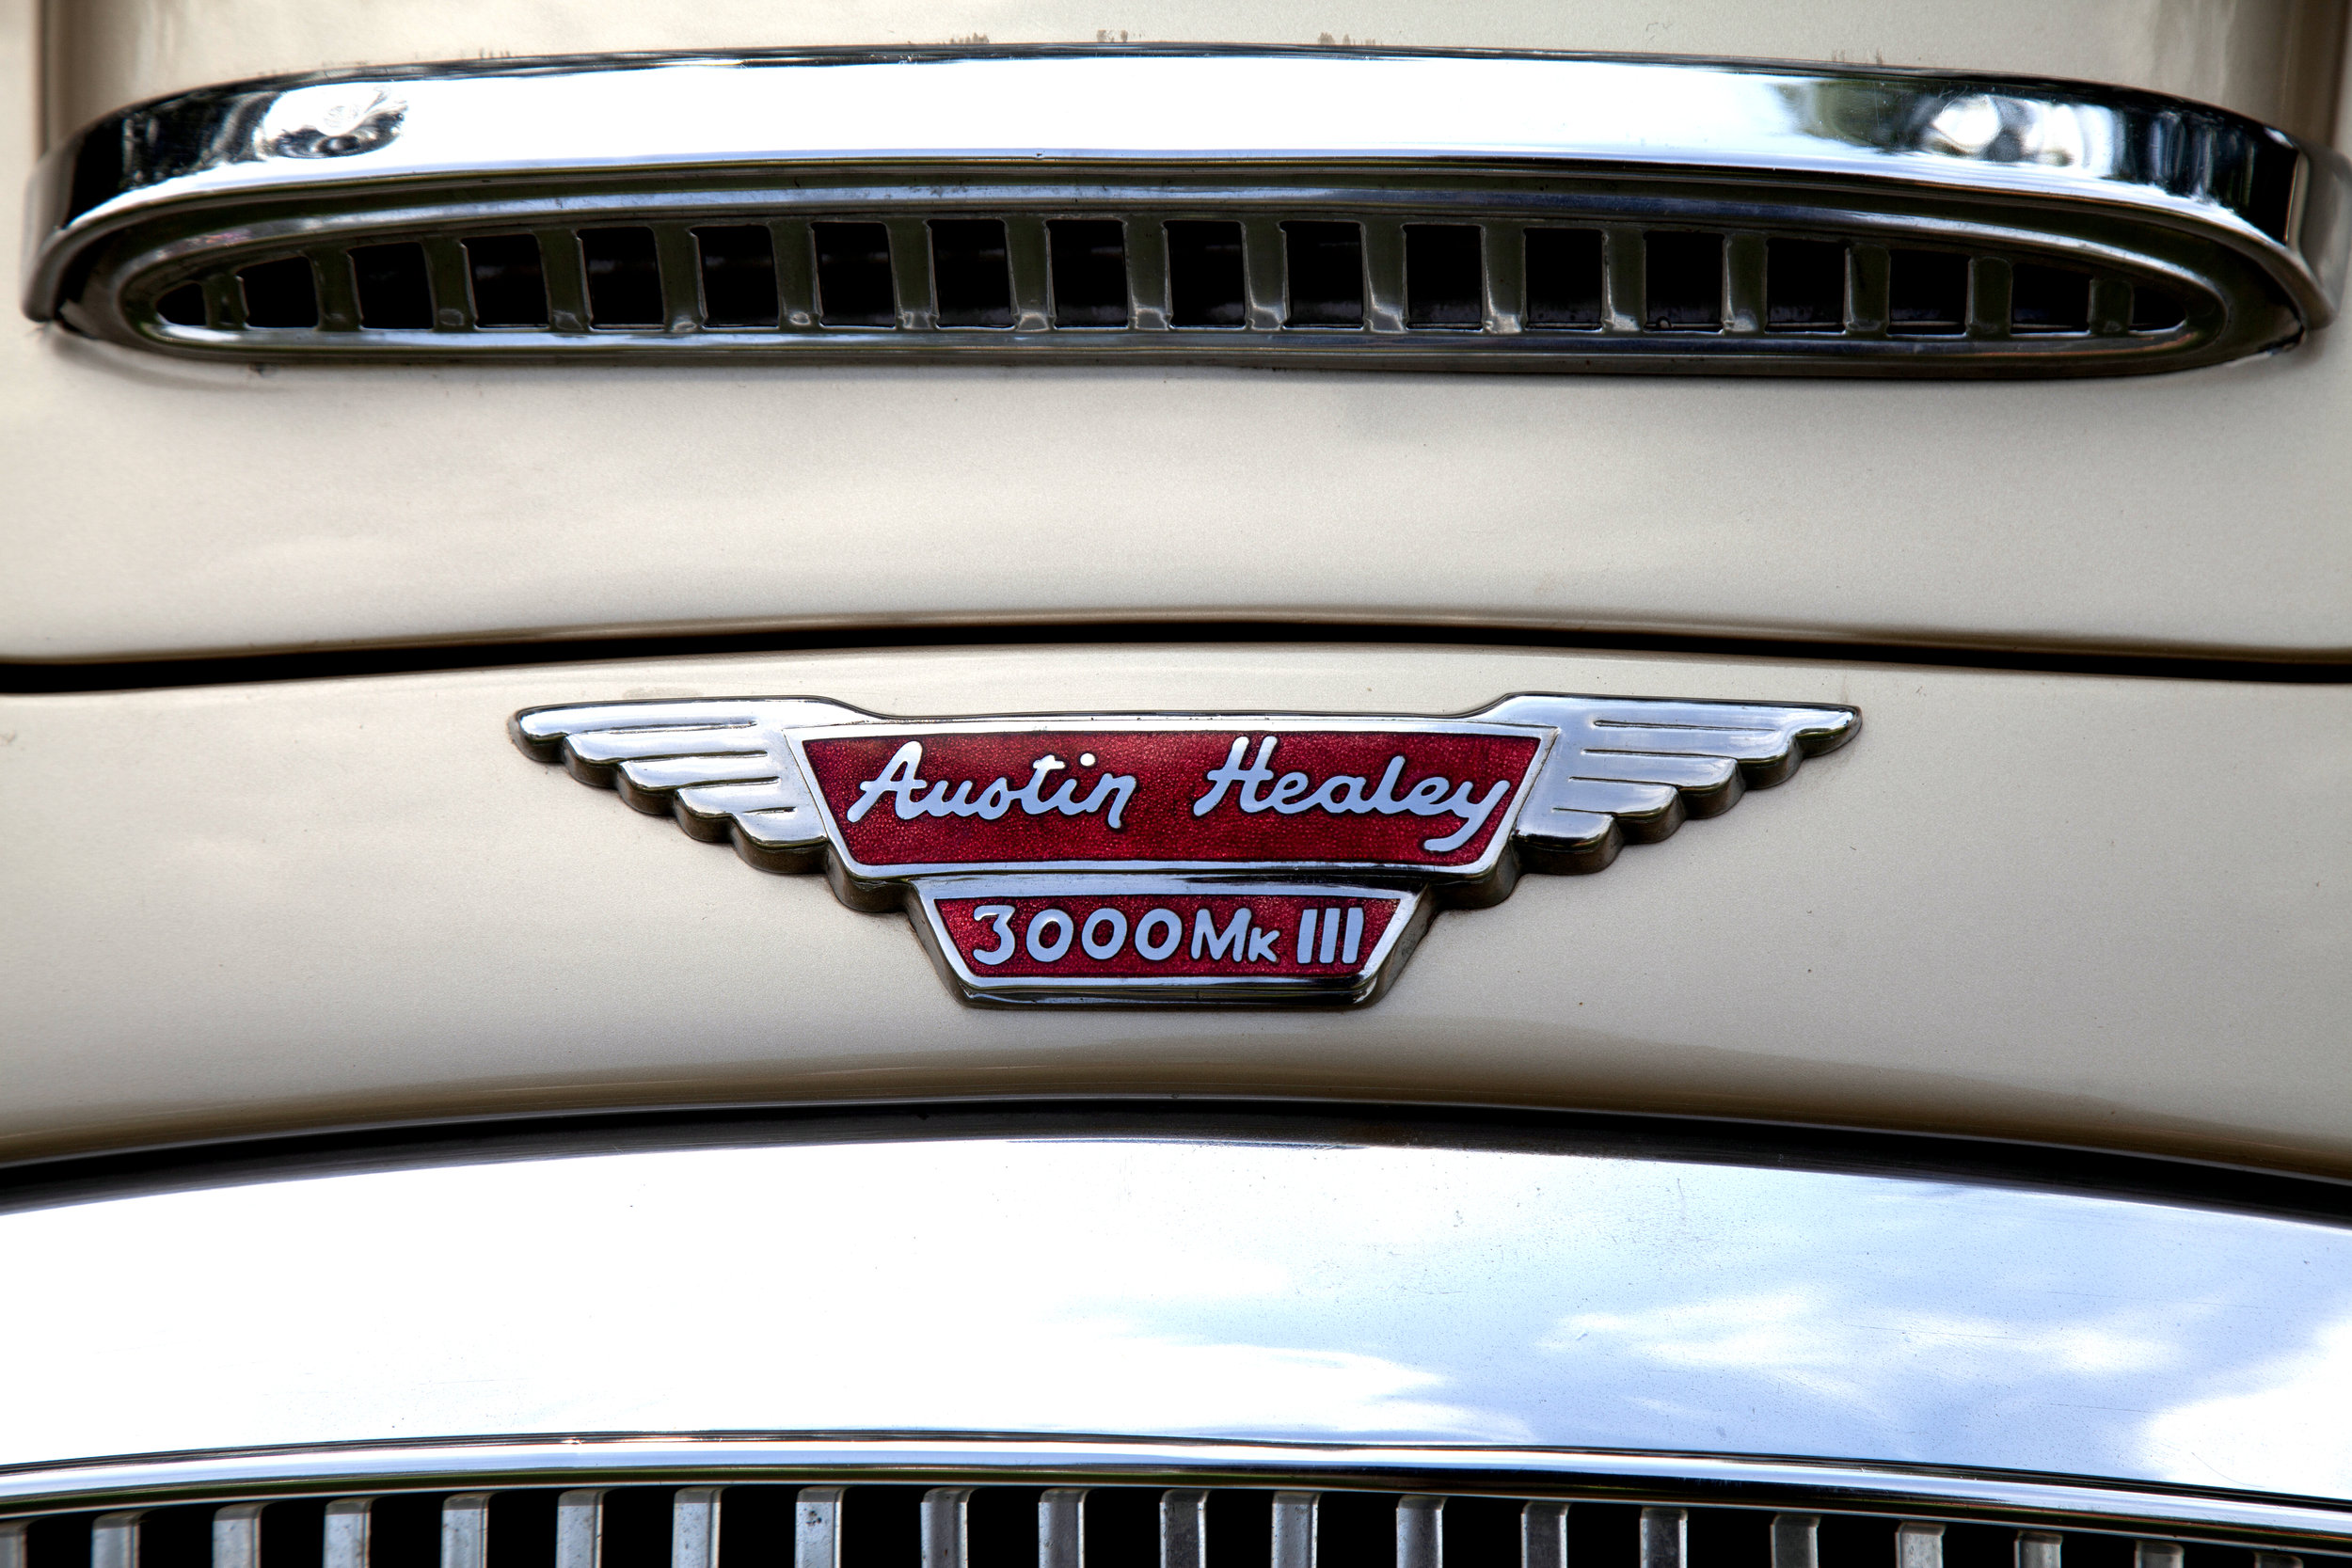 Austin Healy 30000 Mk lll badge.jpg